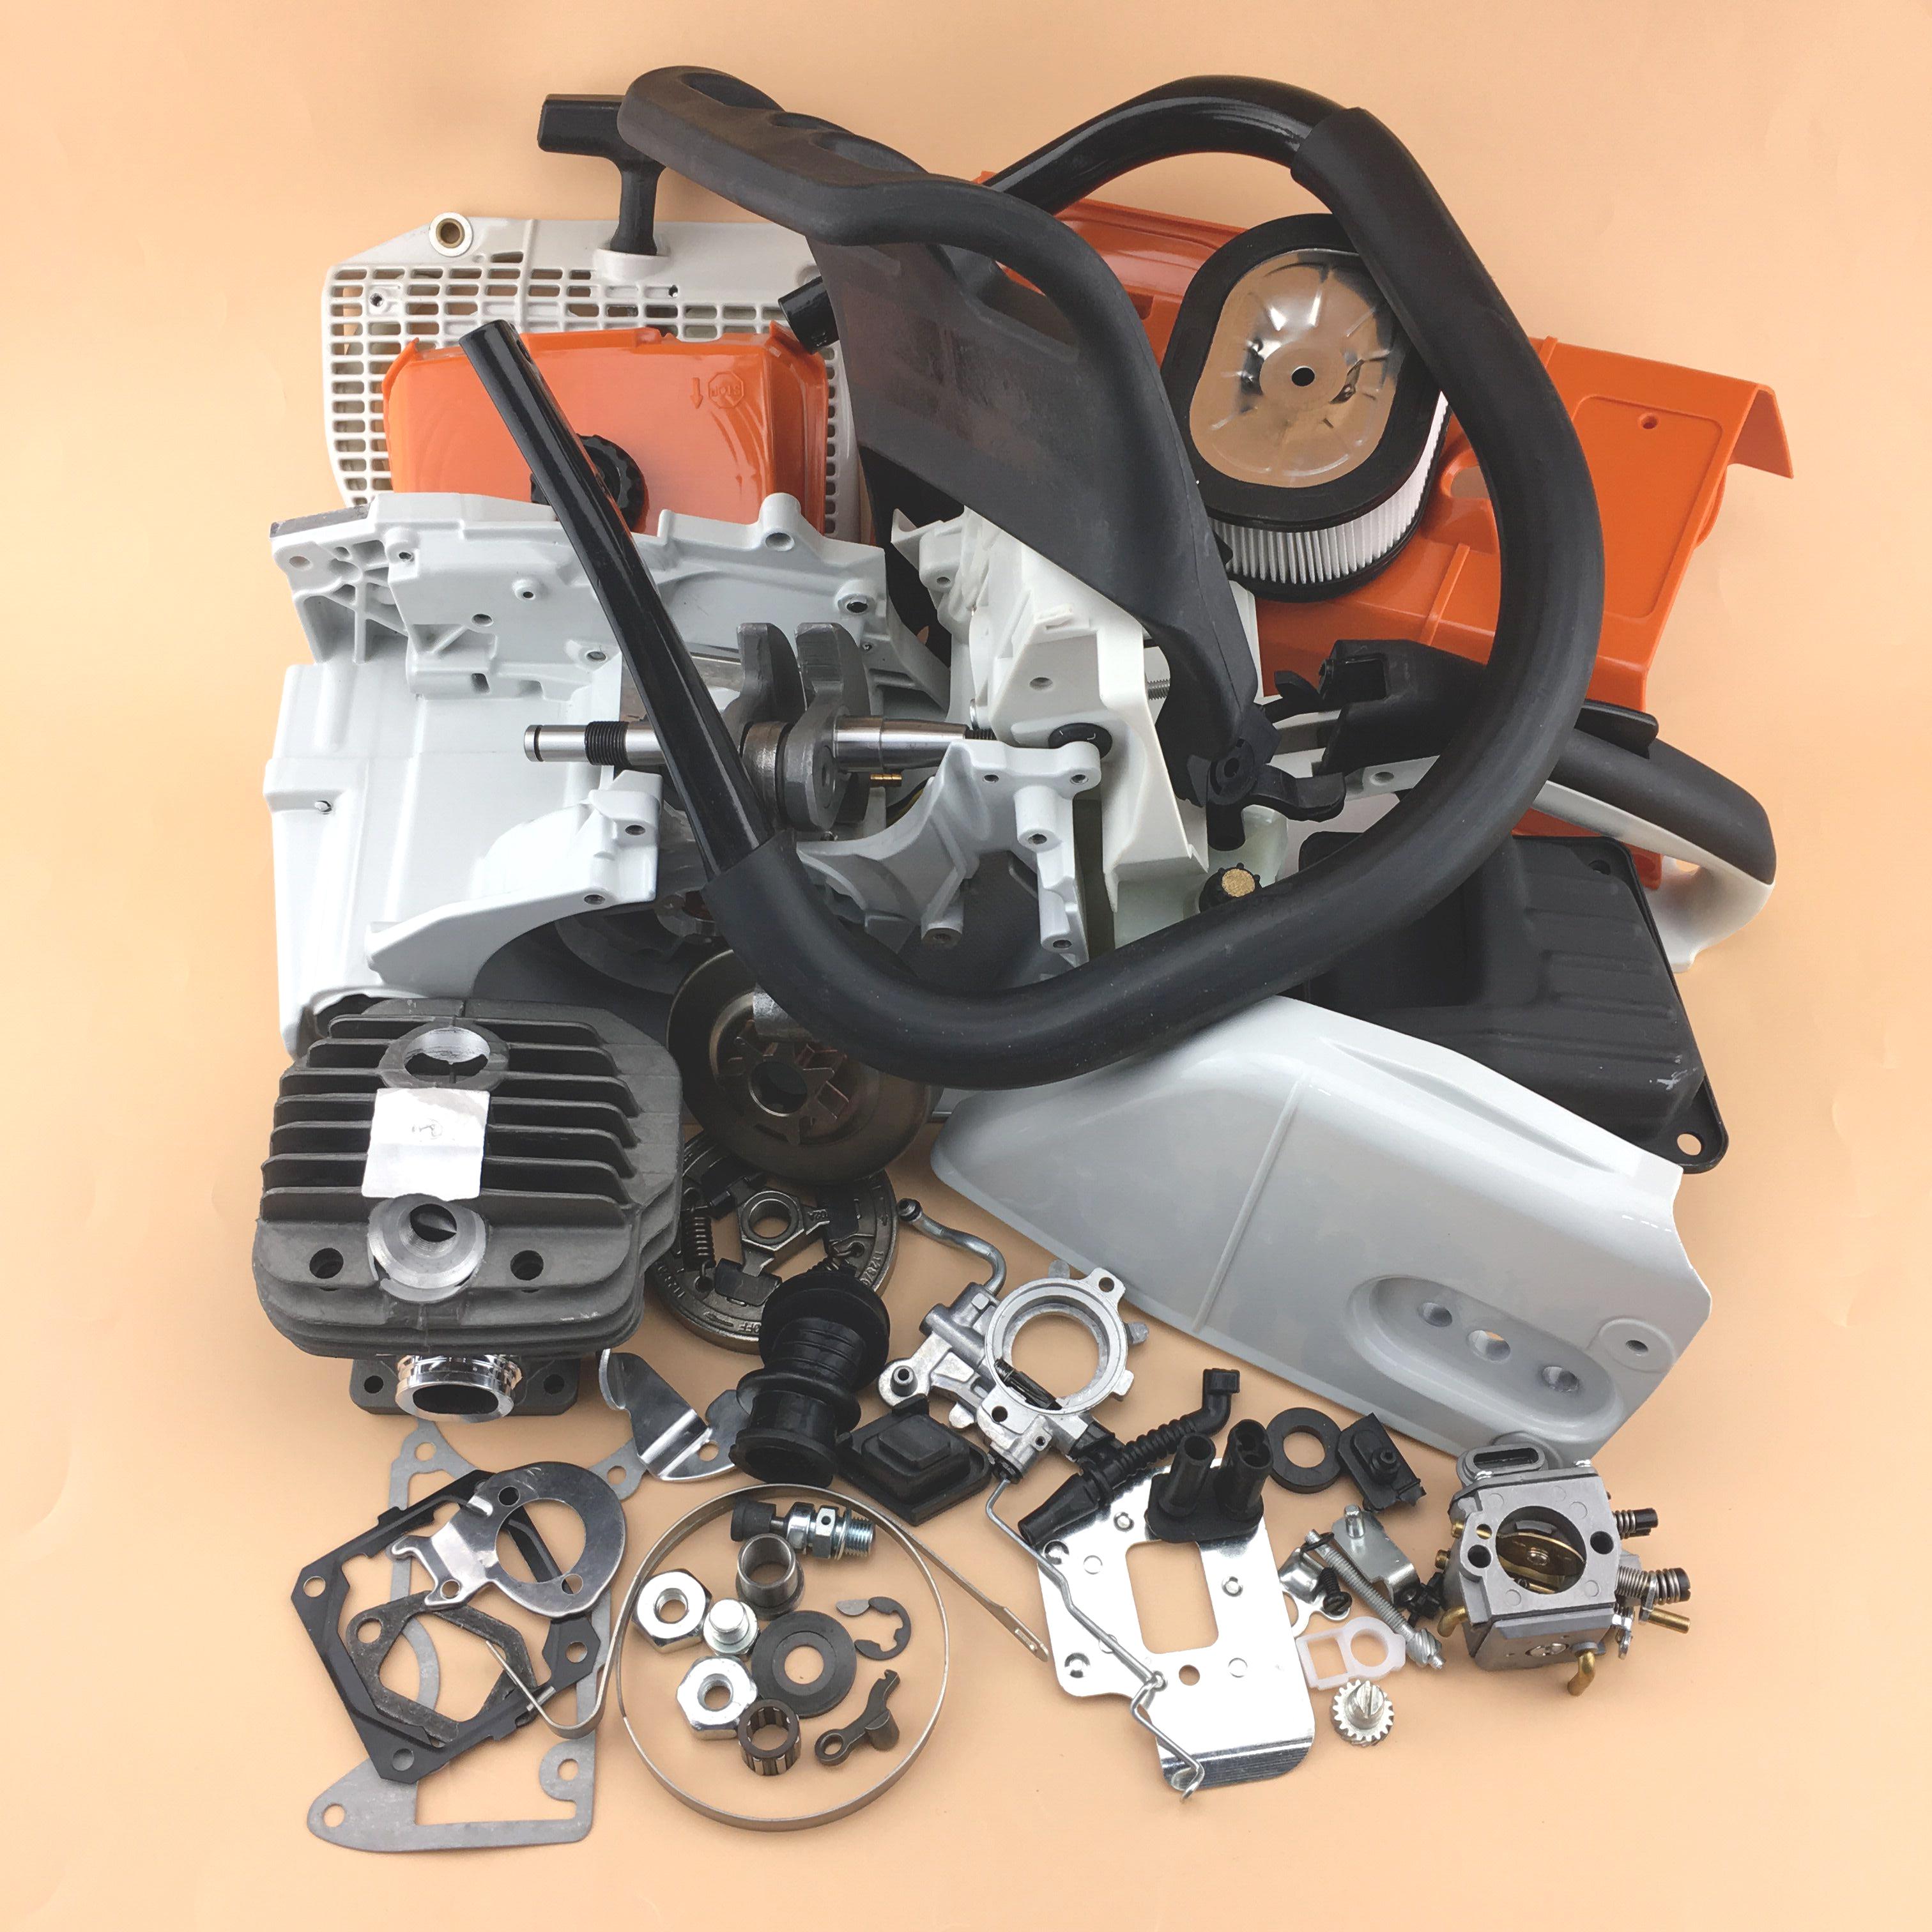 Stihl Chainsaw Parts | Stihl Parts | Stihl Aftermarket Parts